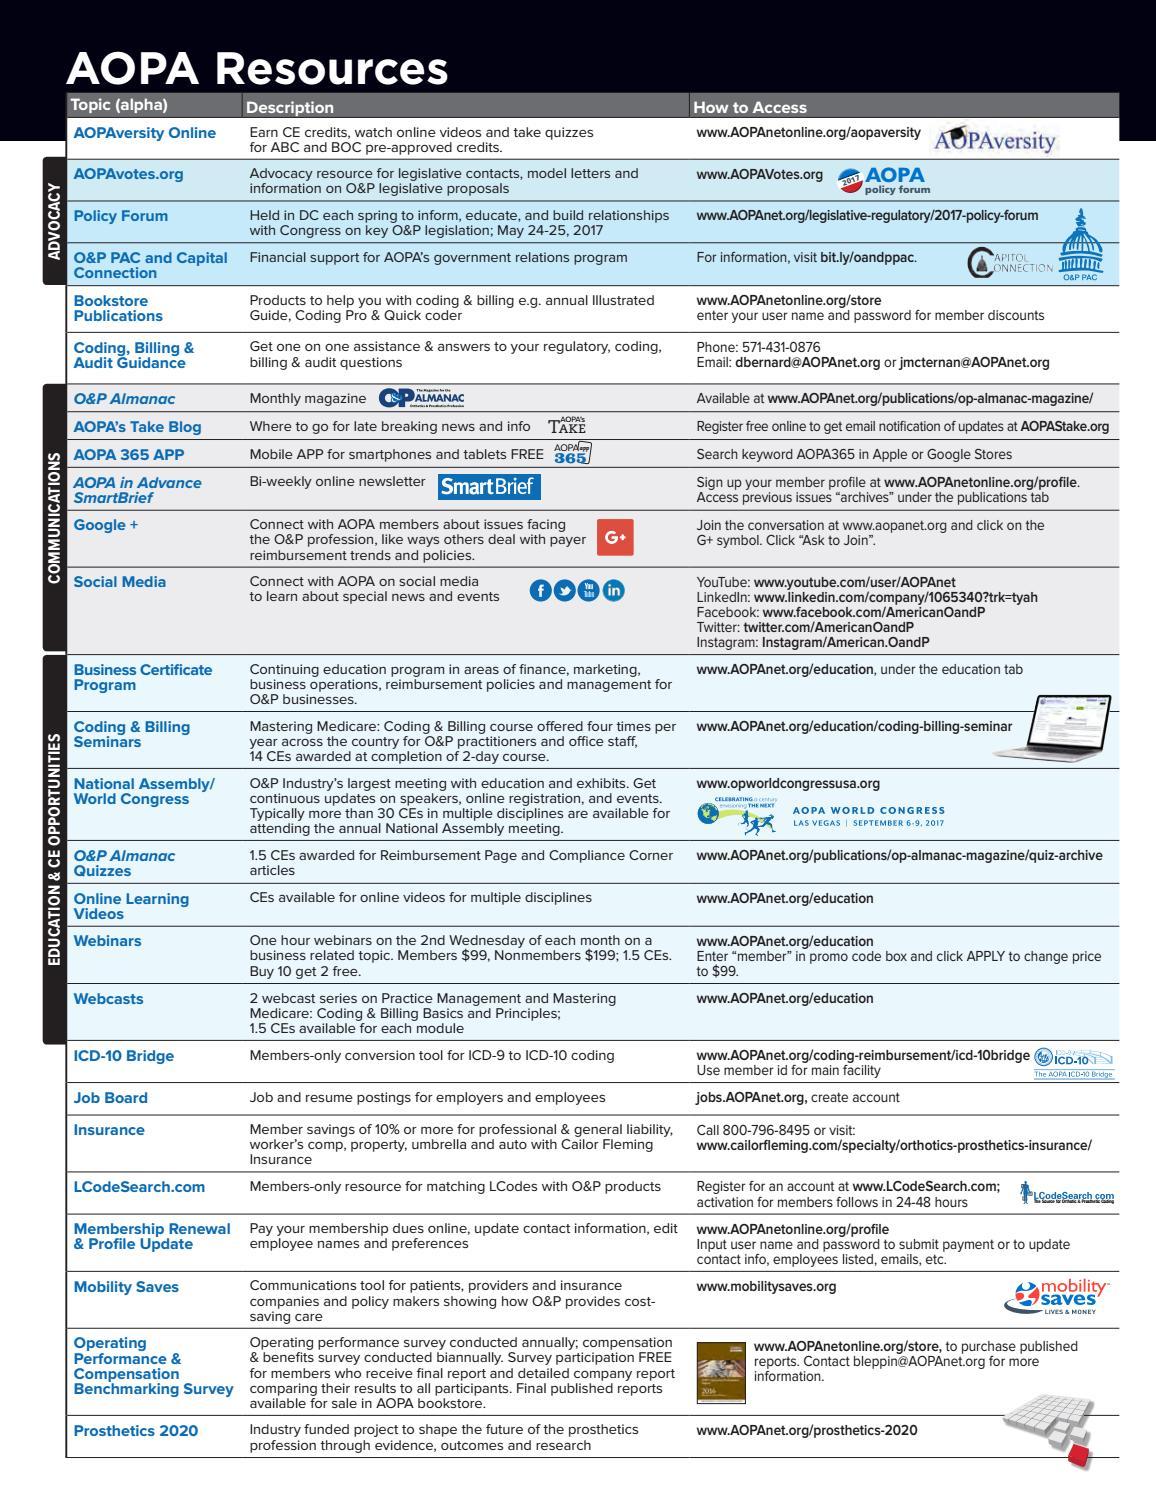 AOPA Centennial Directory by AOPA - issuu